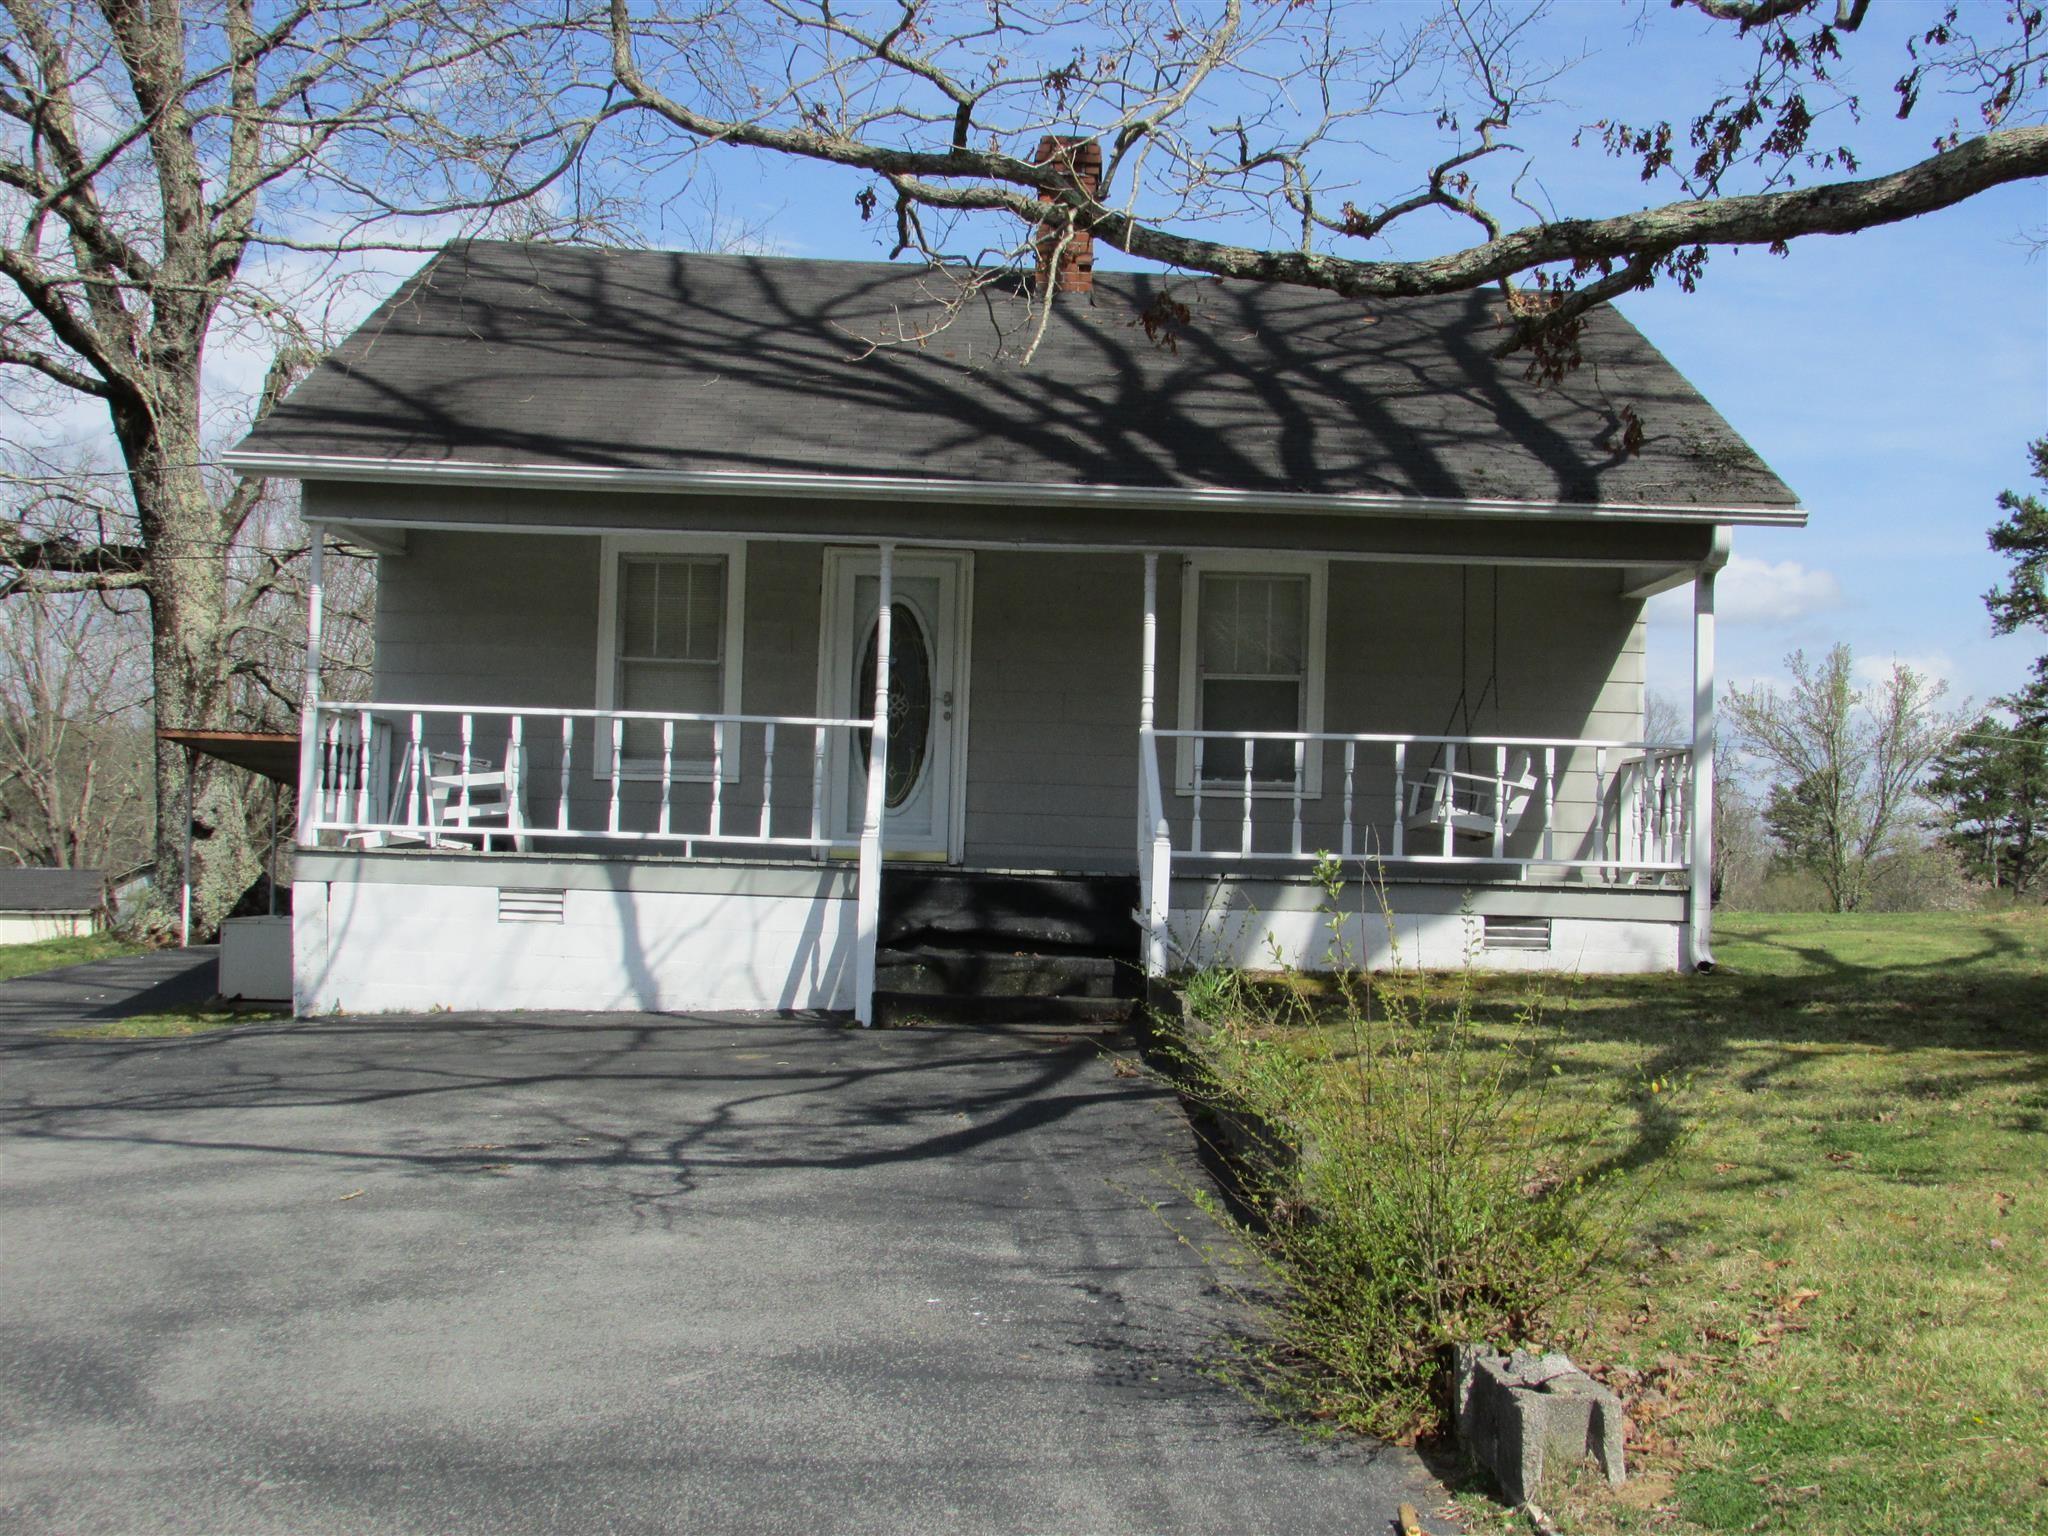 32205 Sr 108 Property Photo - Gruetli Laager, TN real estate listing